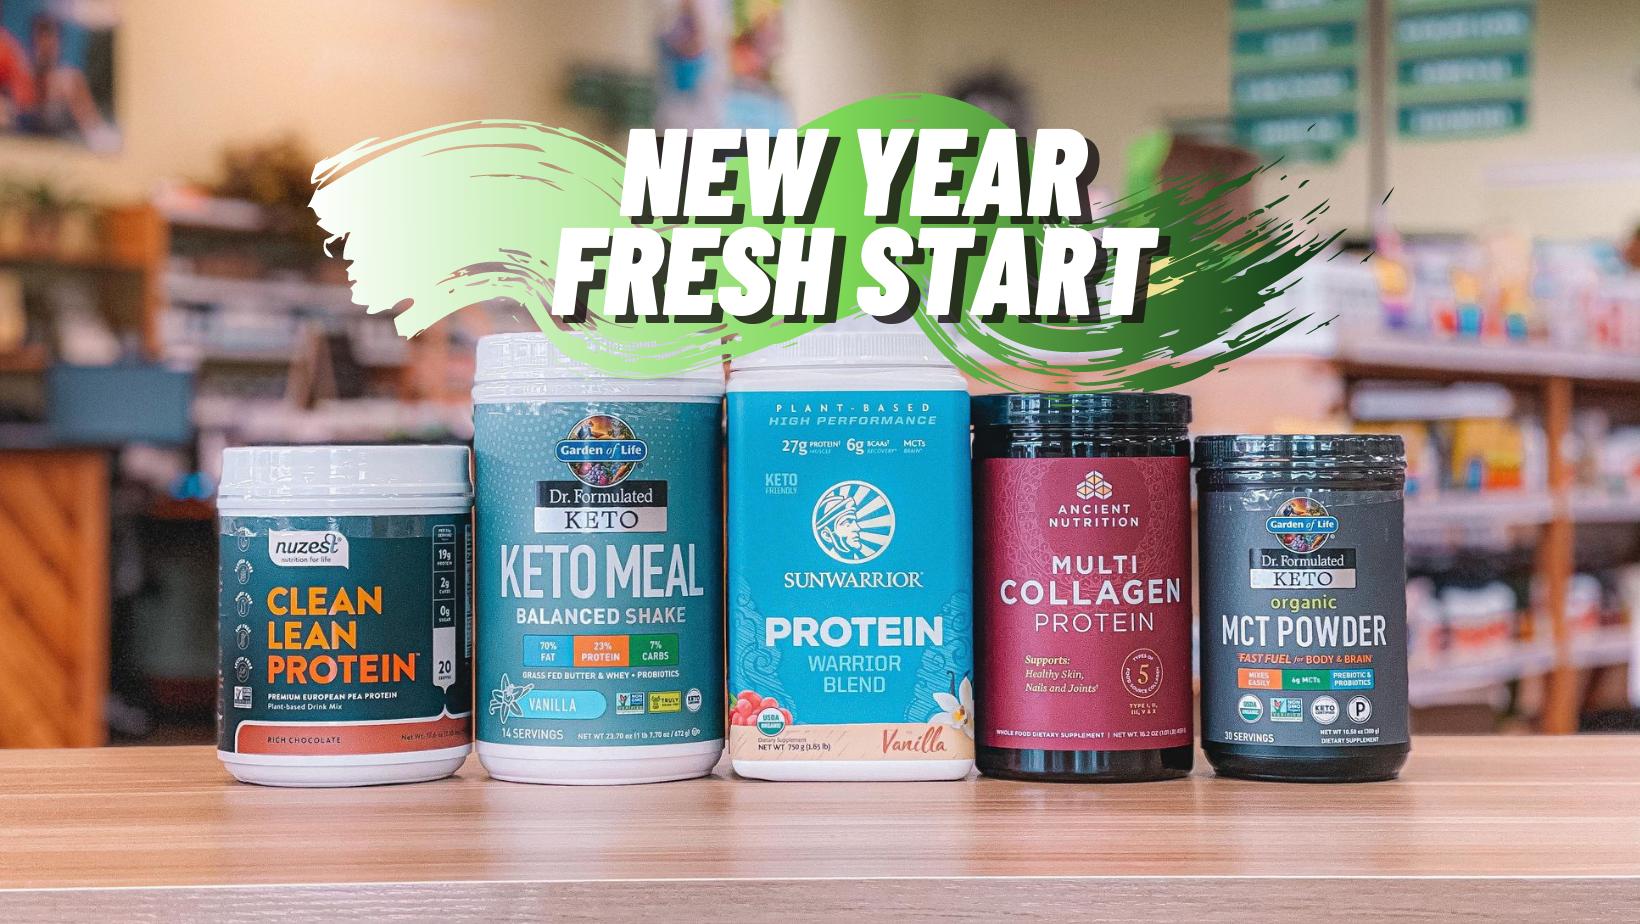 New-Year-Fresh-Start-Rebekahs-Health-and-Nutrition